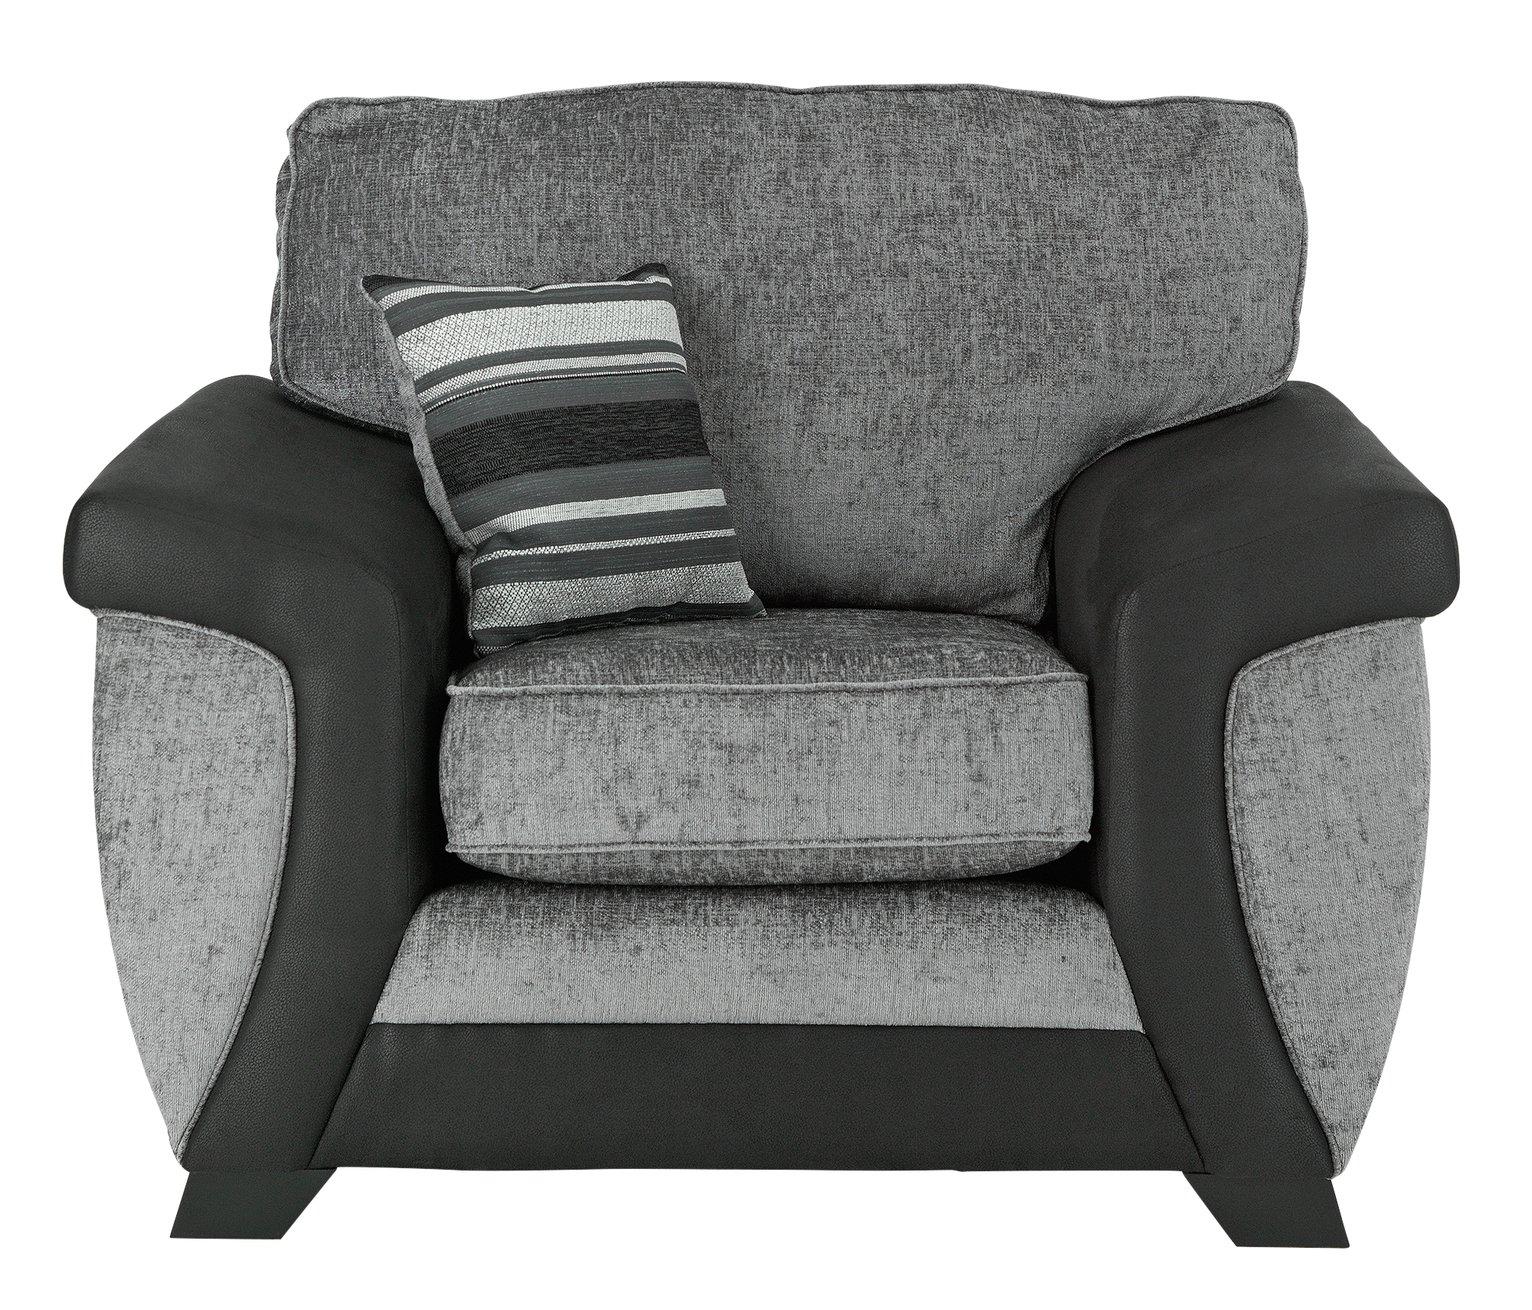 Argos Home Illusion Fabric Cuddle Chair - Black & Grey